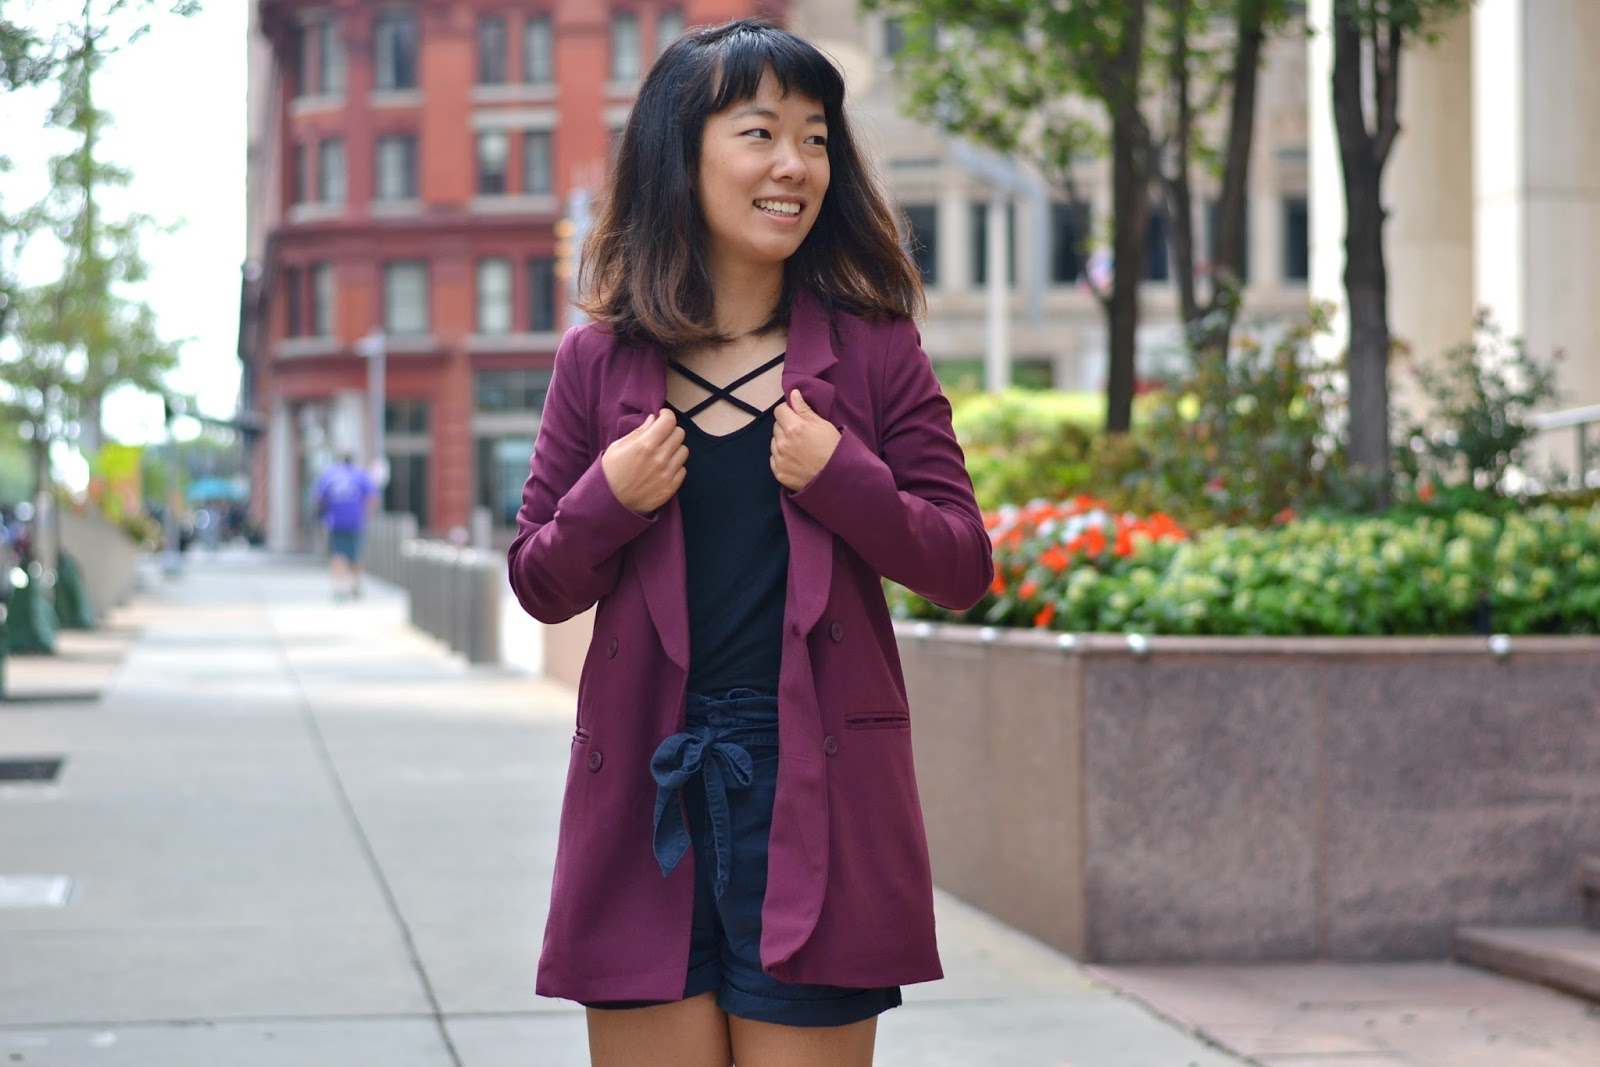 maroon blazer outfit, black criss cross shirt outift